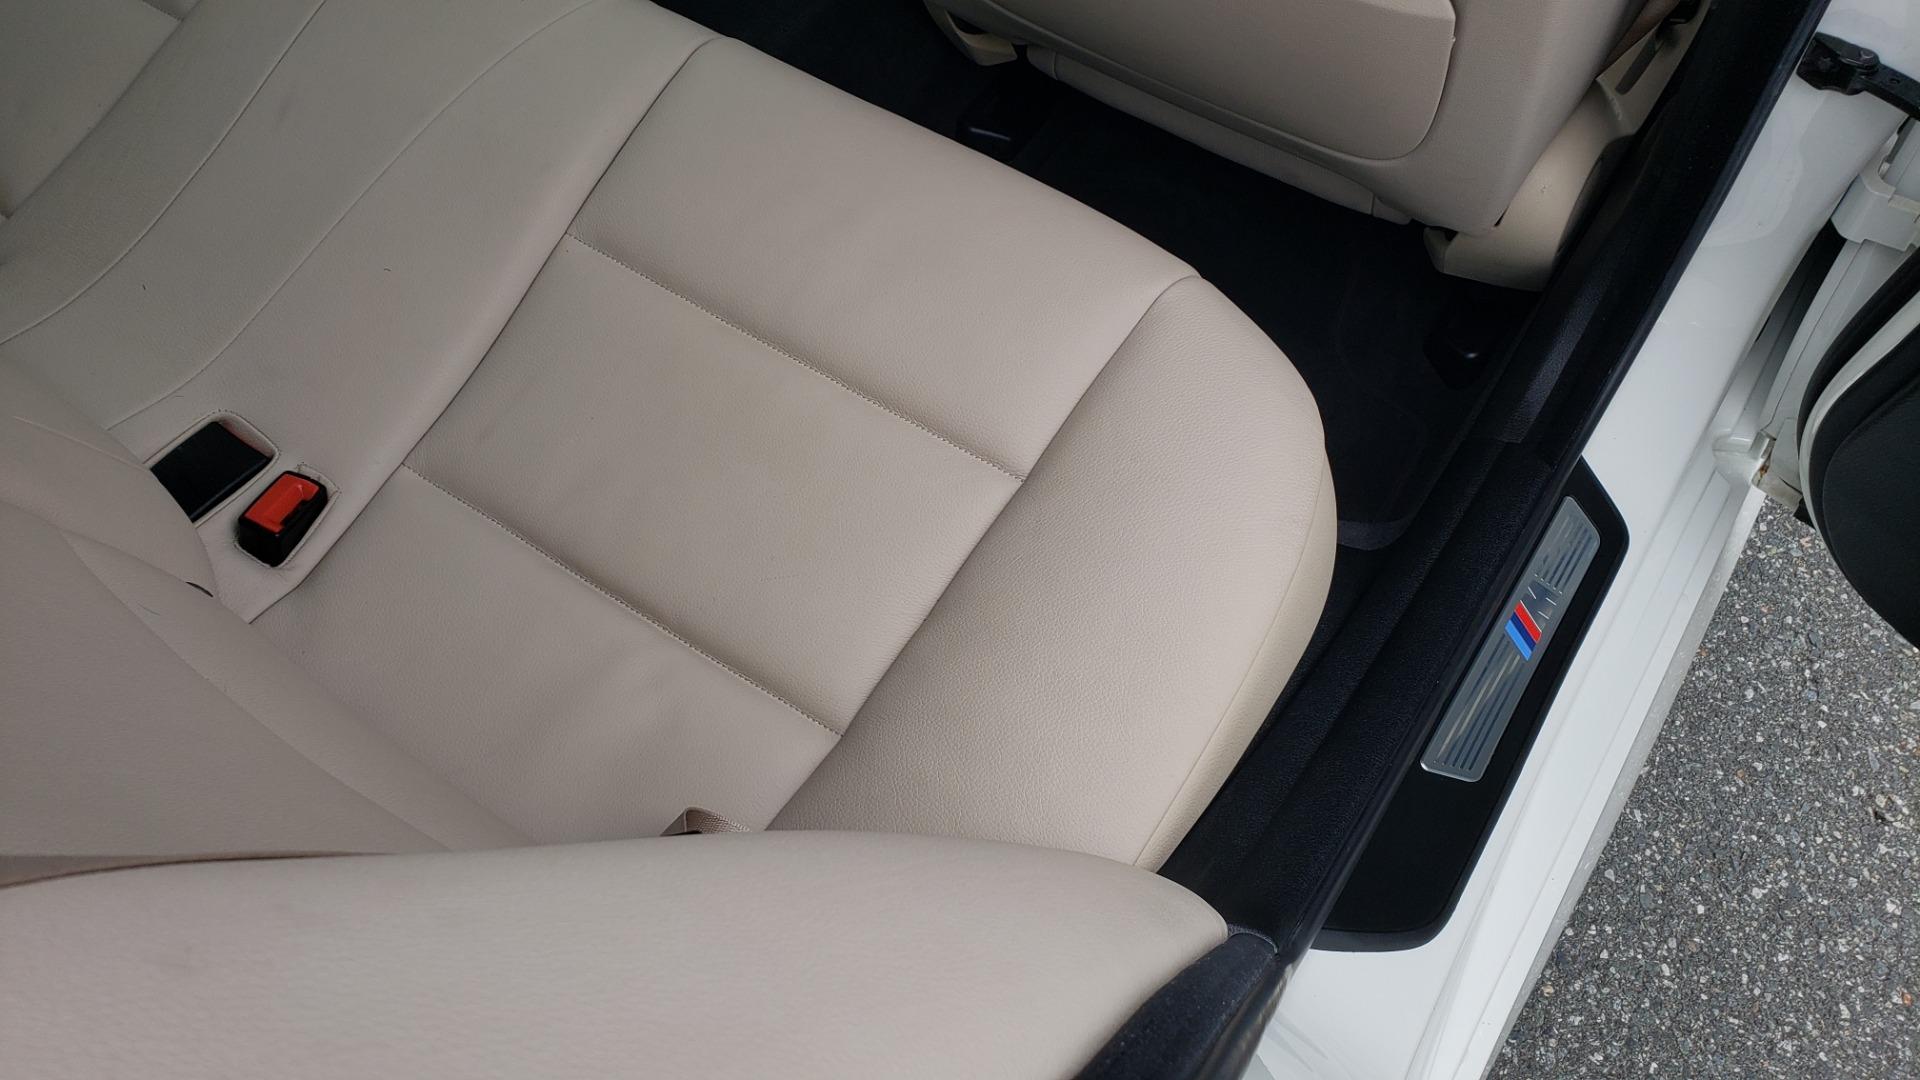 Used 2012 BMW 5 SERIES 550I M SPORT / NAV / CONV PKG / SUNROOF / PREM SND / REARVIEW for sale Sold at Formula Imports in Charlotte NC 28227 59